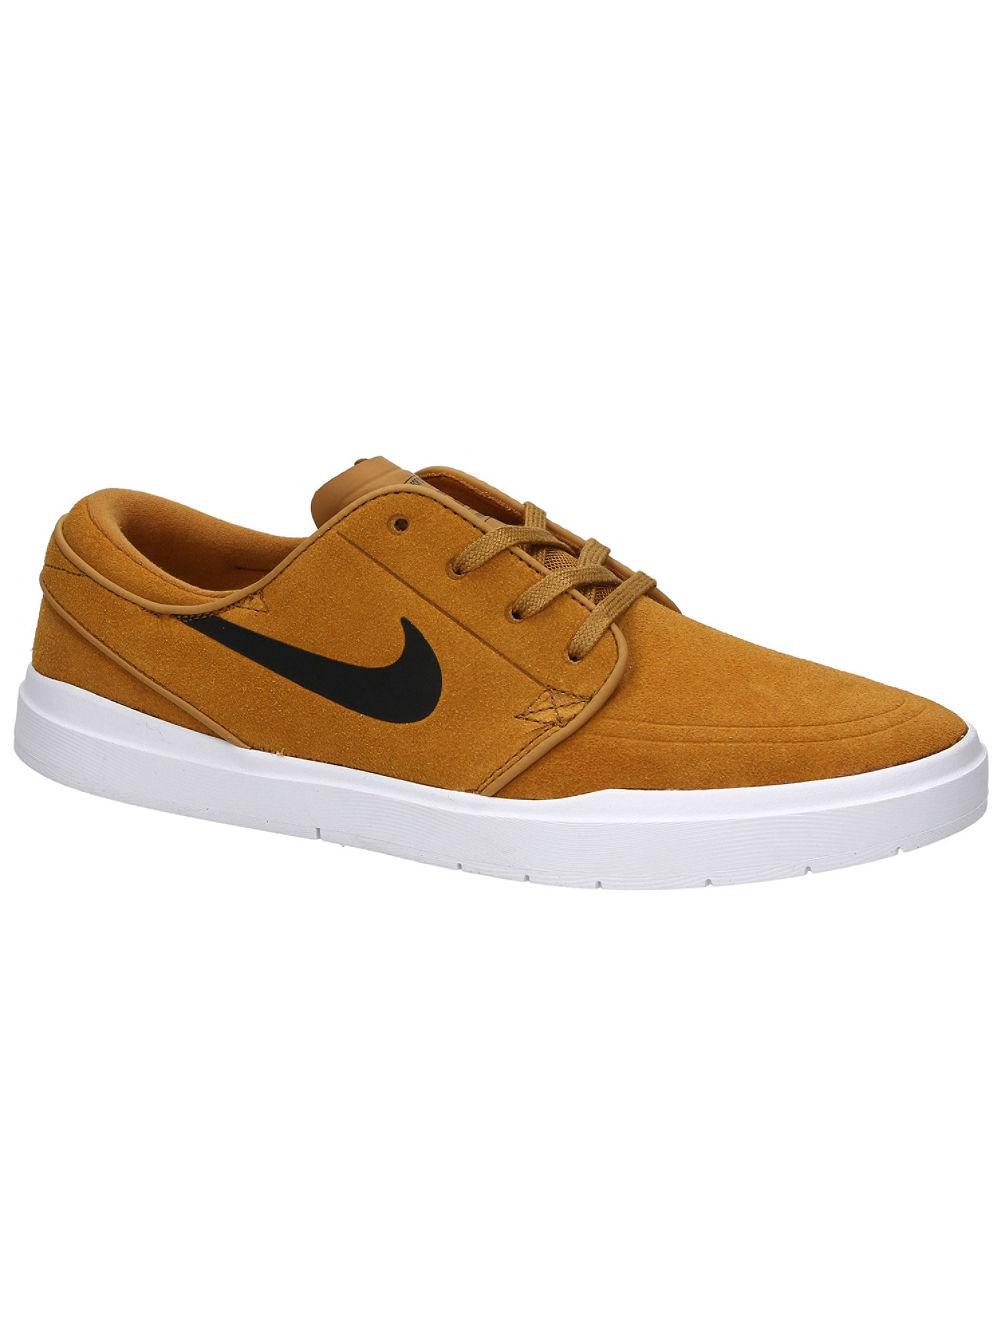 b85e0435d25c Buy Nike Stefan Janoski Hyperfeel Skate Shoes online at Blue Tomato